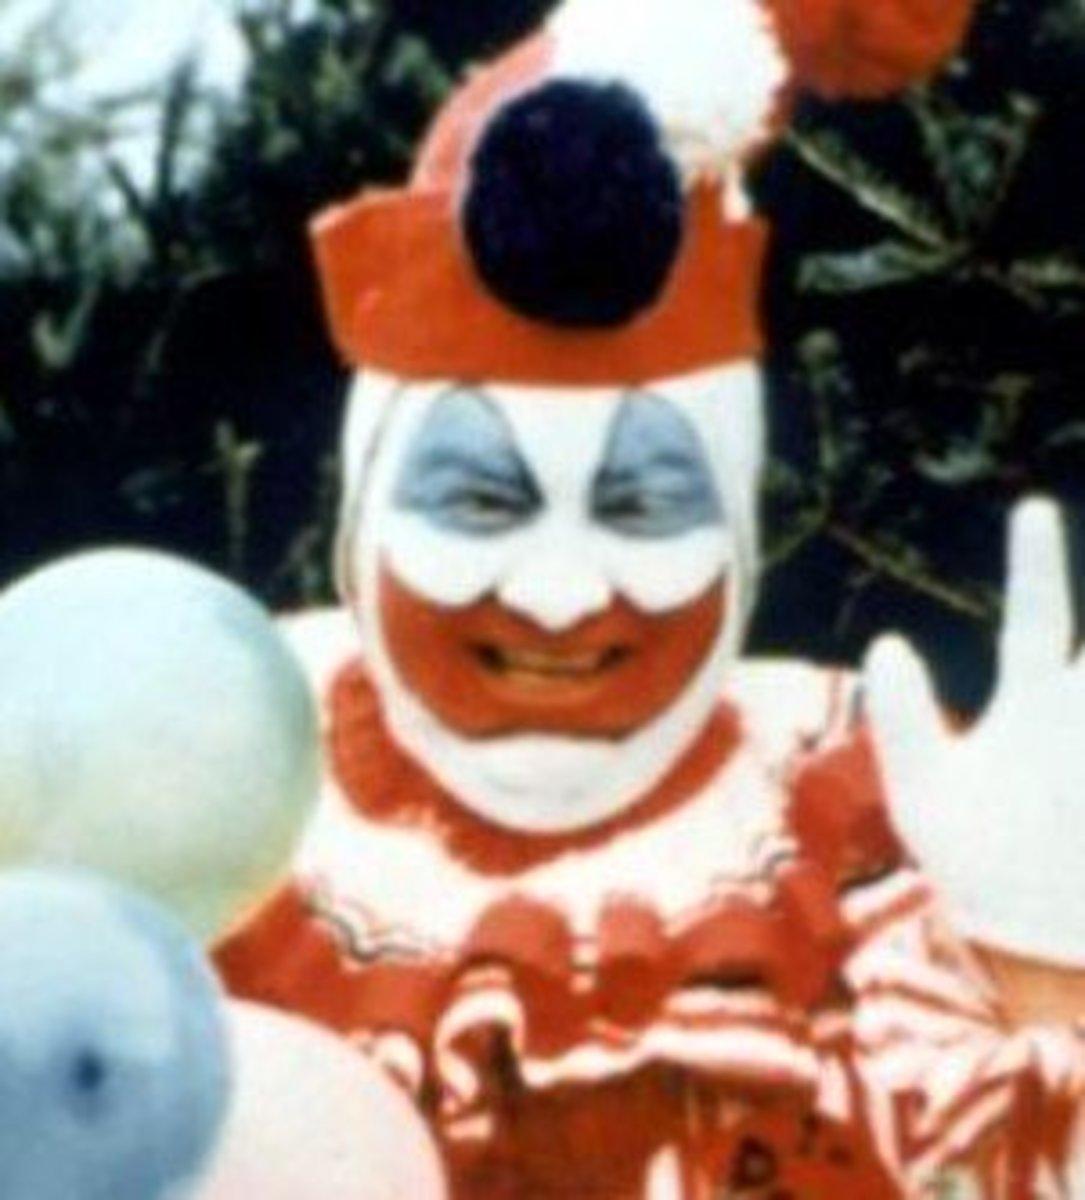 Serial killer John Wayne Gacy in his Pogo costume